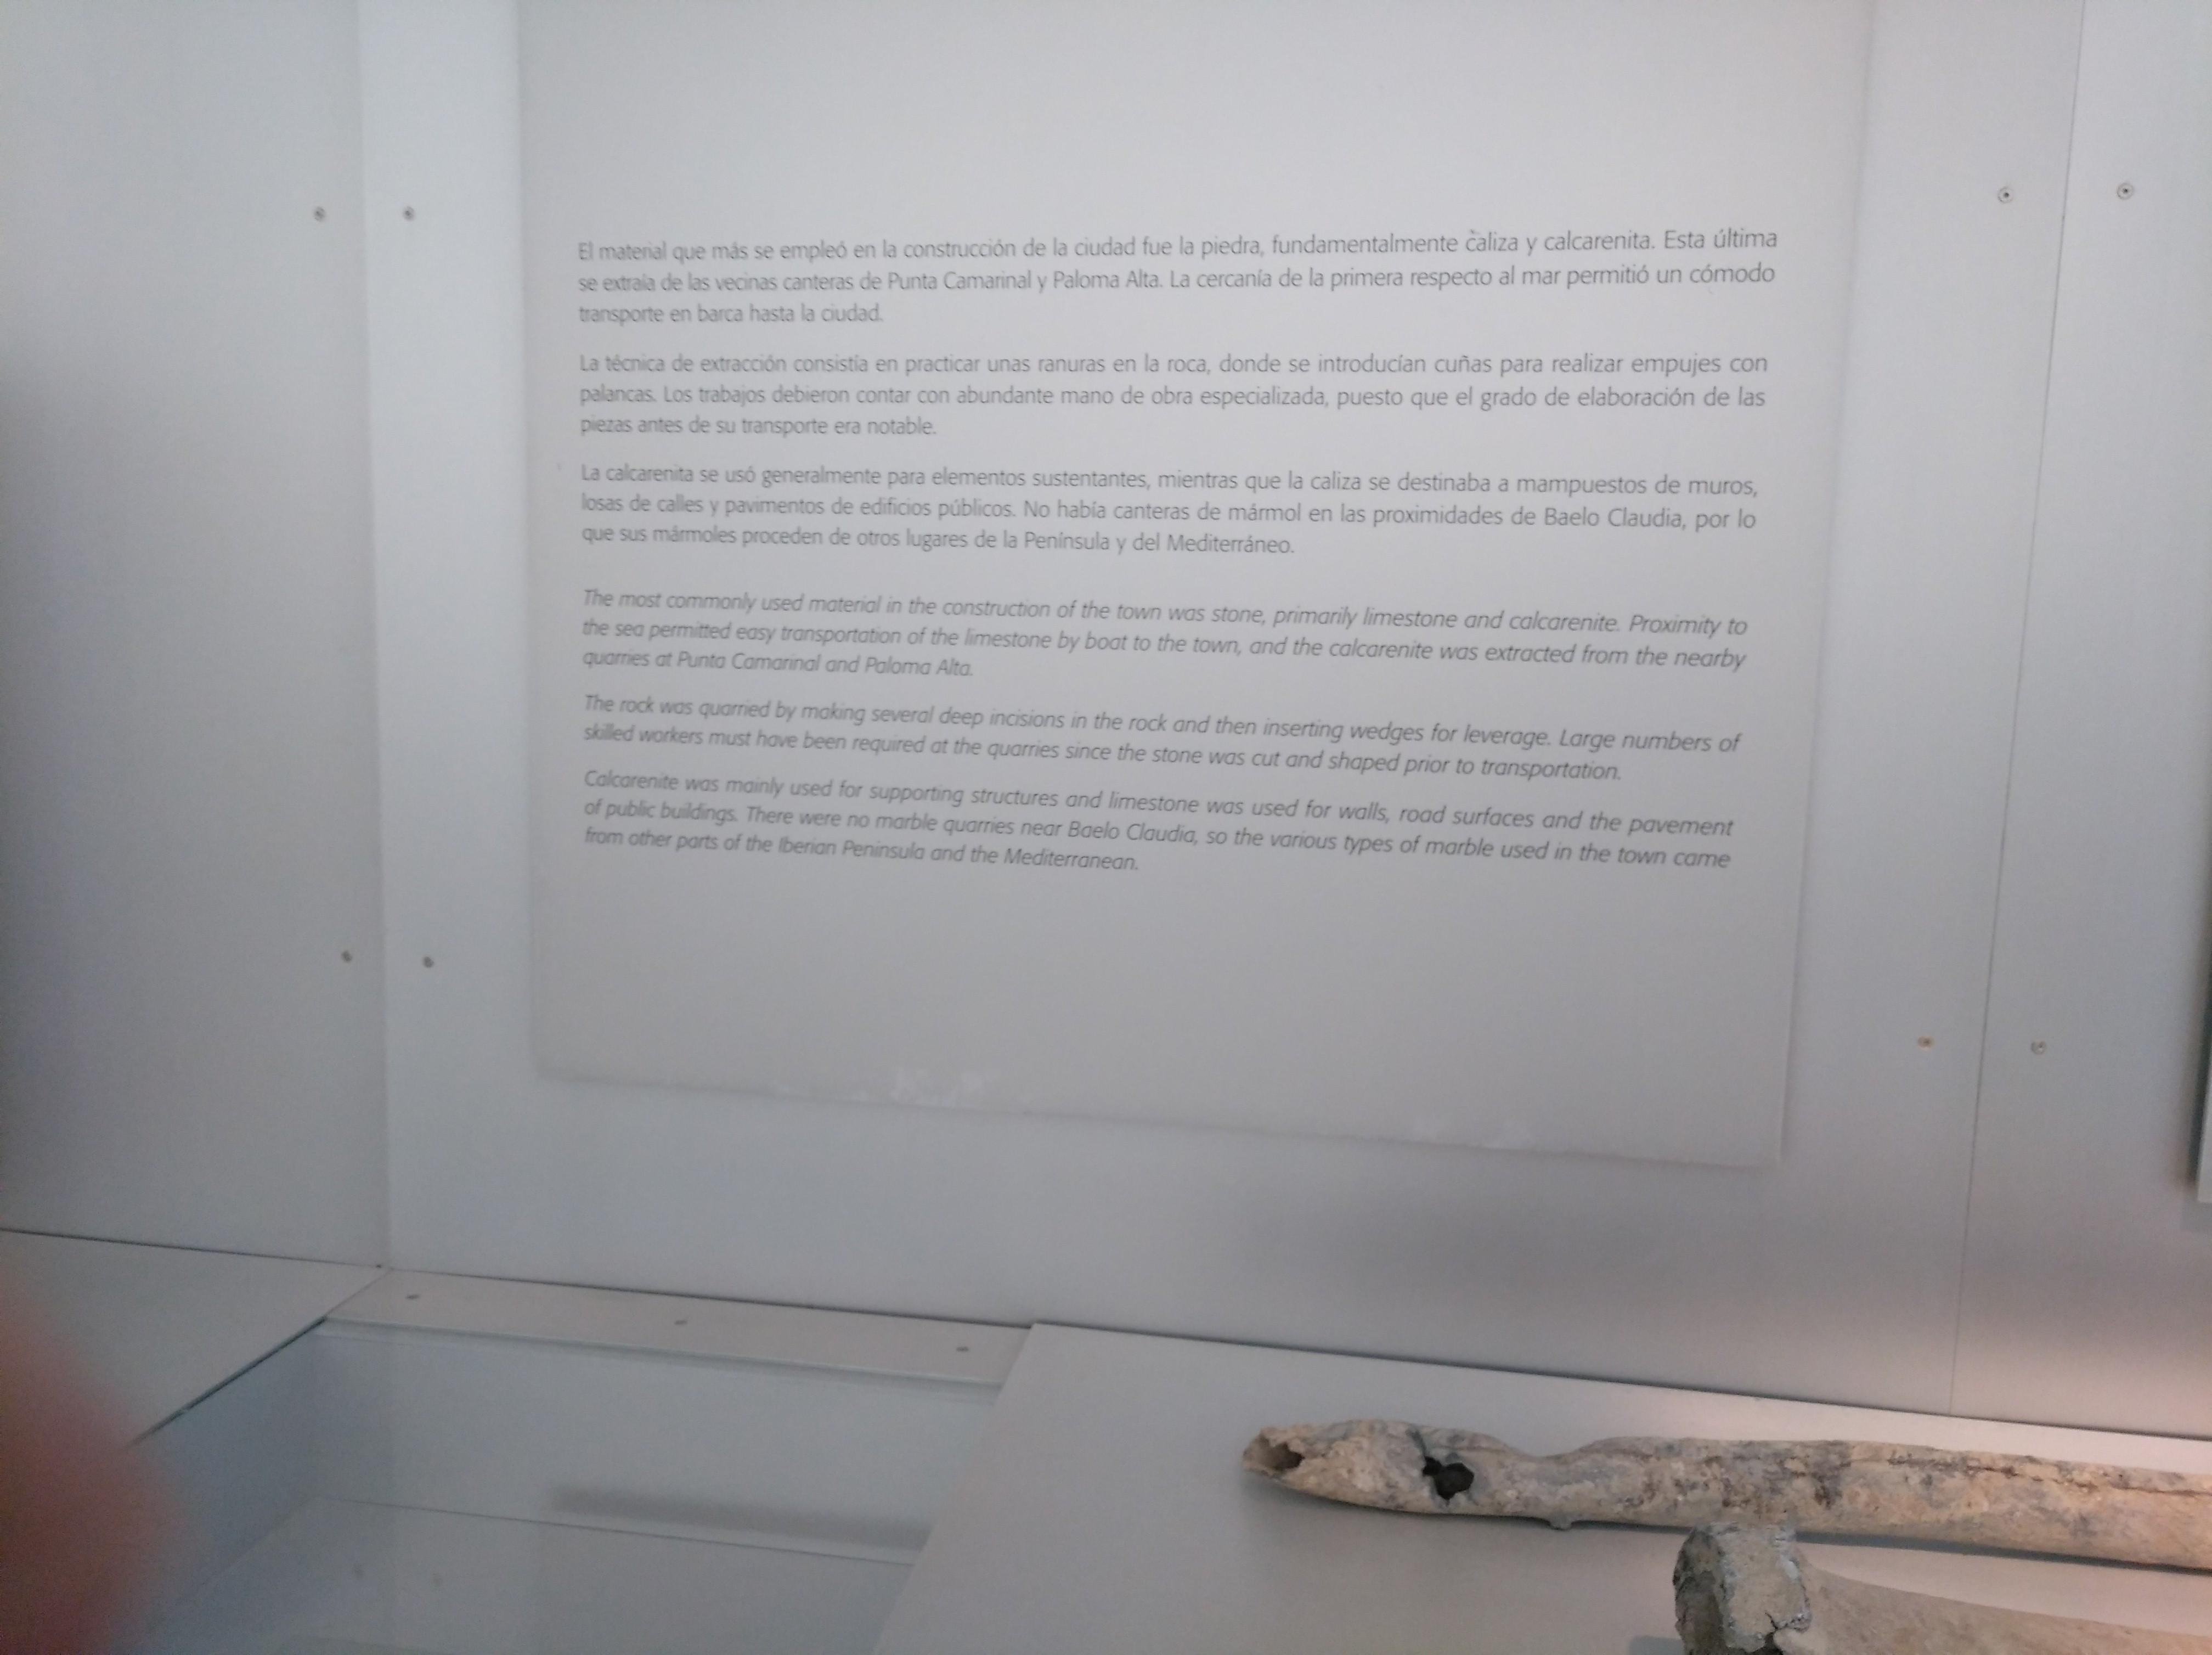 Antes La Vecina file:museo arqueológico de baelo claudia, tarifa (cádiz) 15